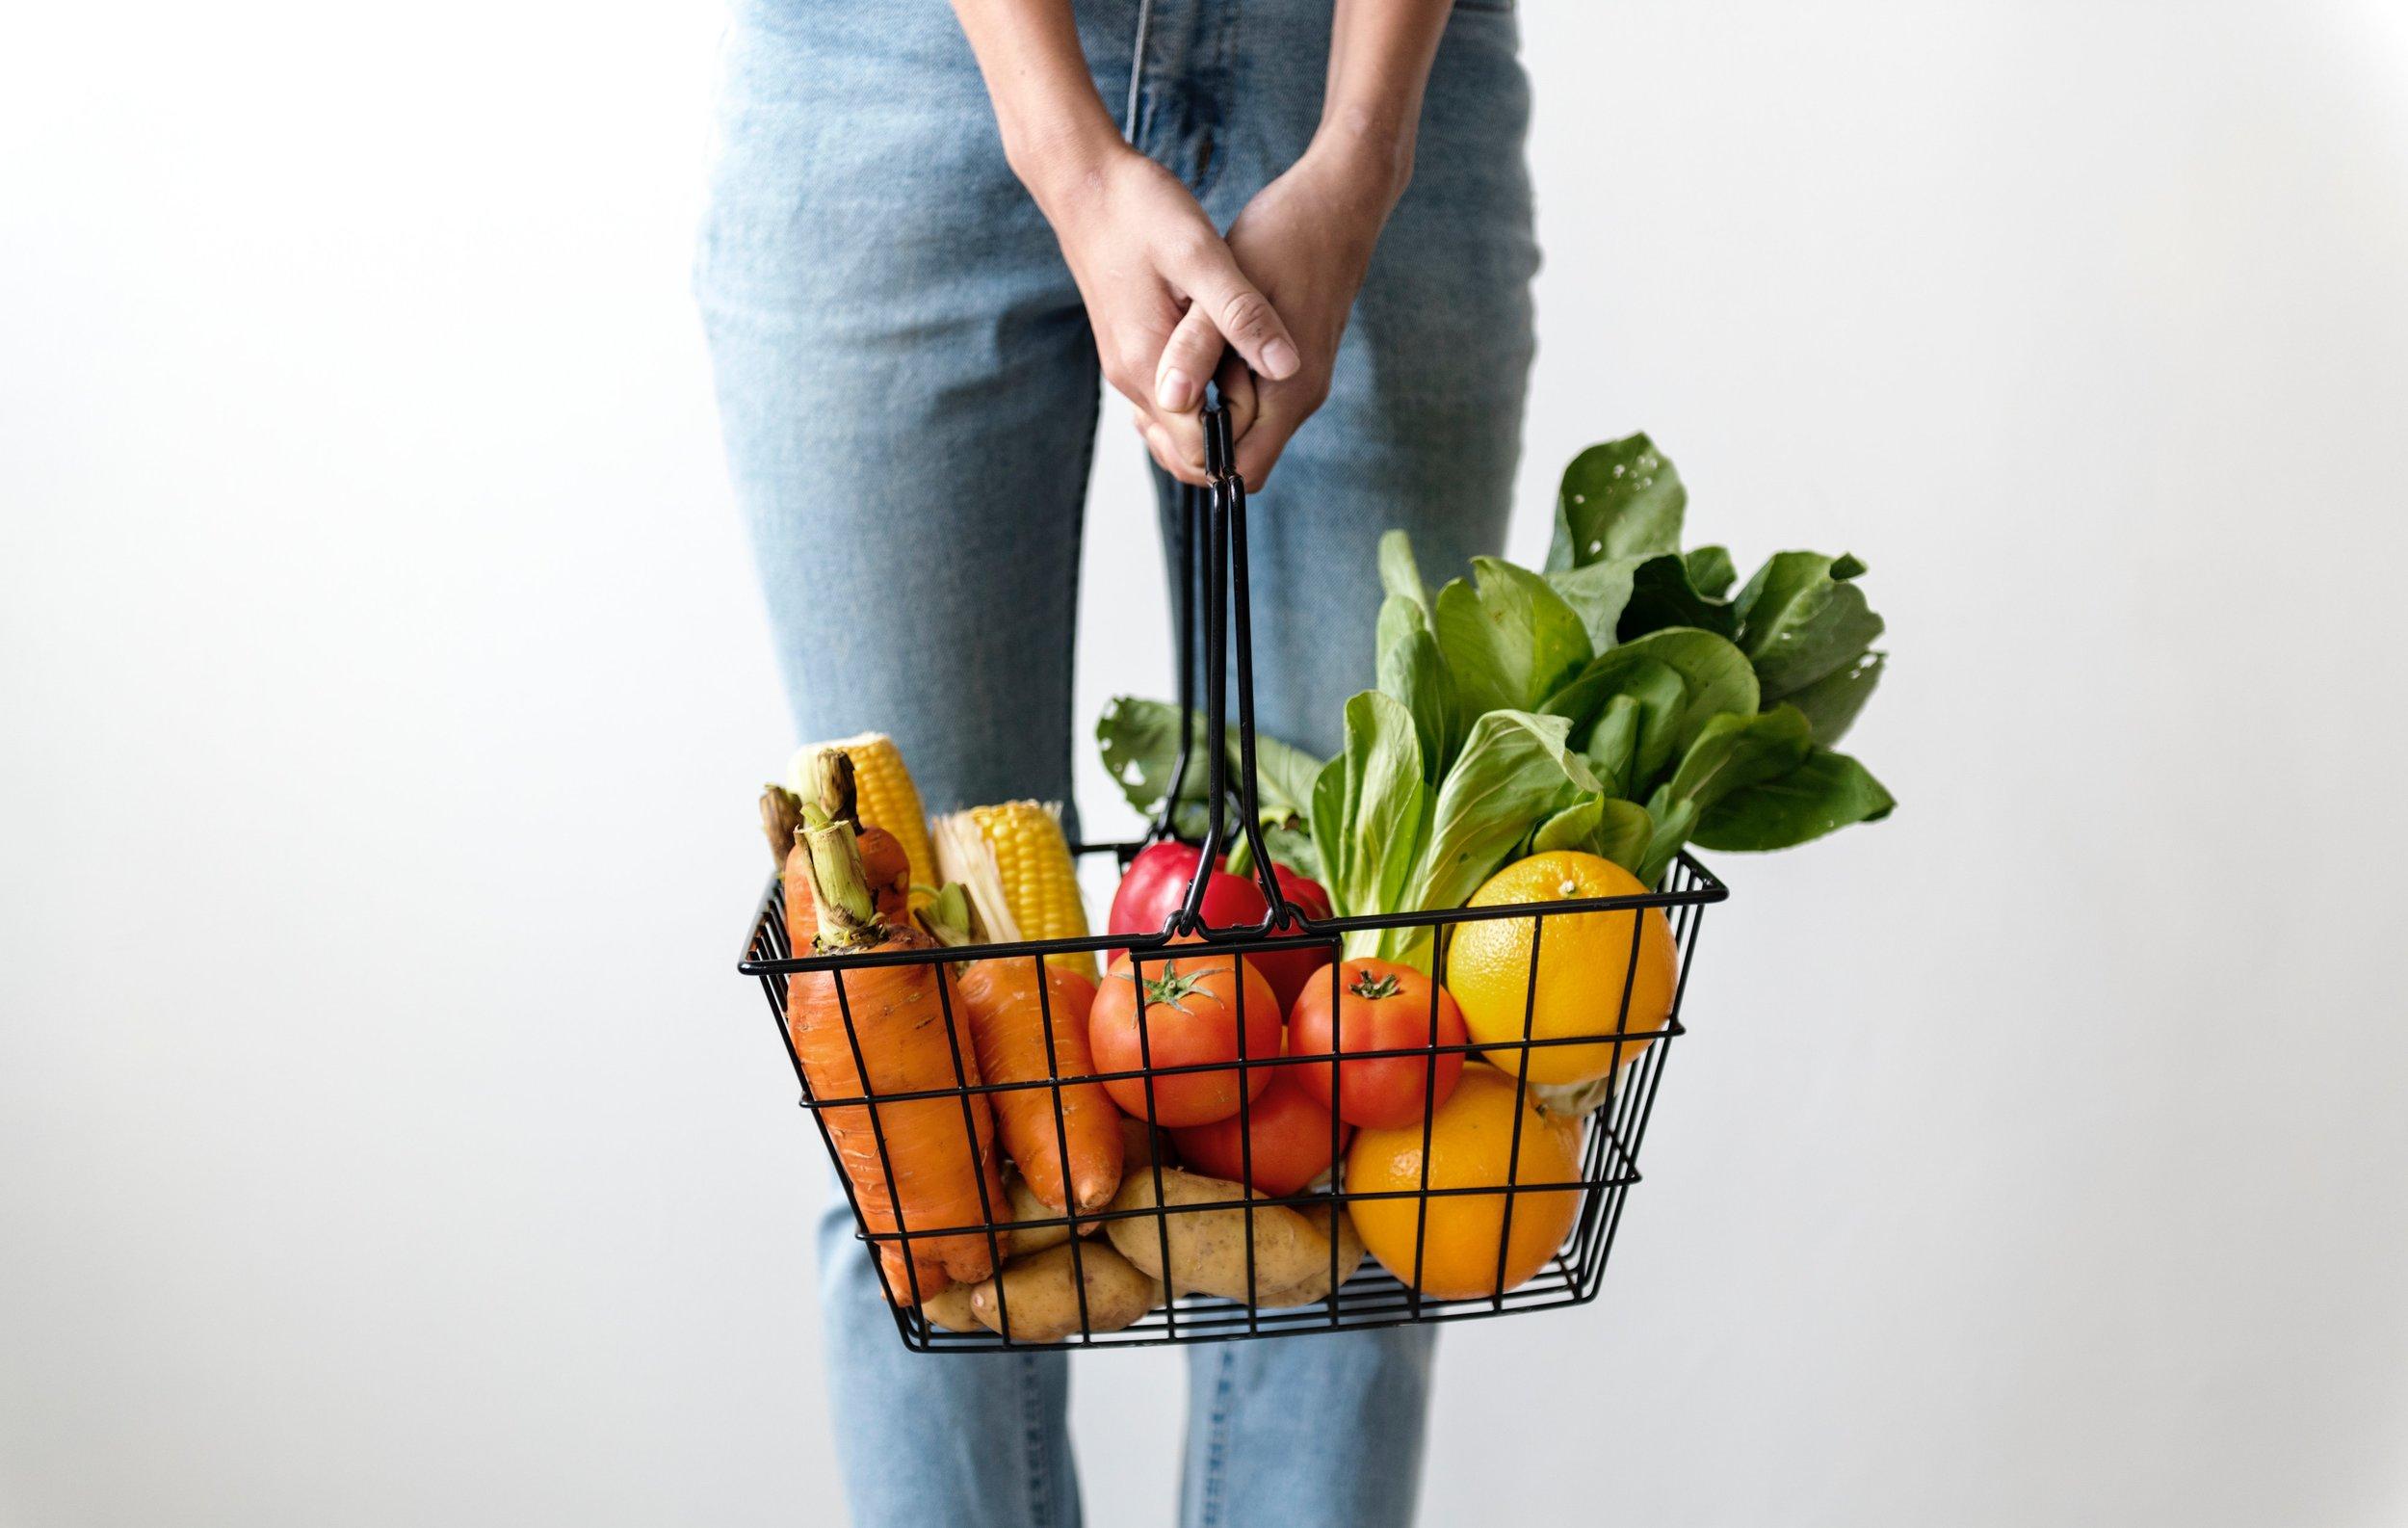 alone-basket-carrots-1389103.jpg